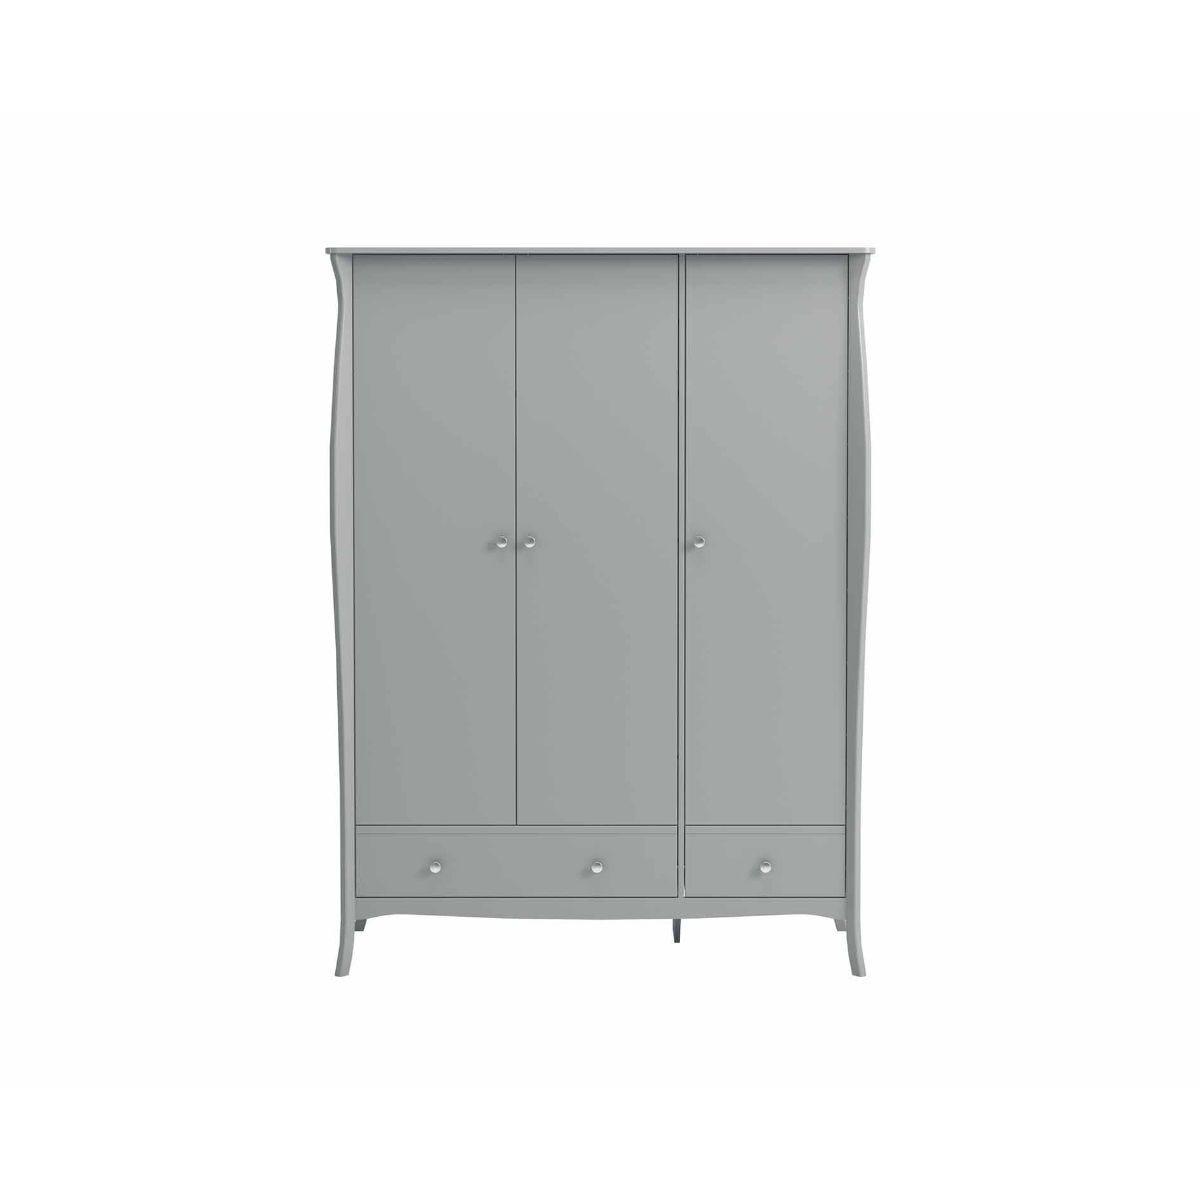 Steens Baroque 3 Door Wardrobe, Grey